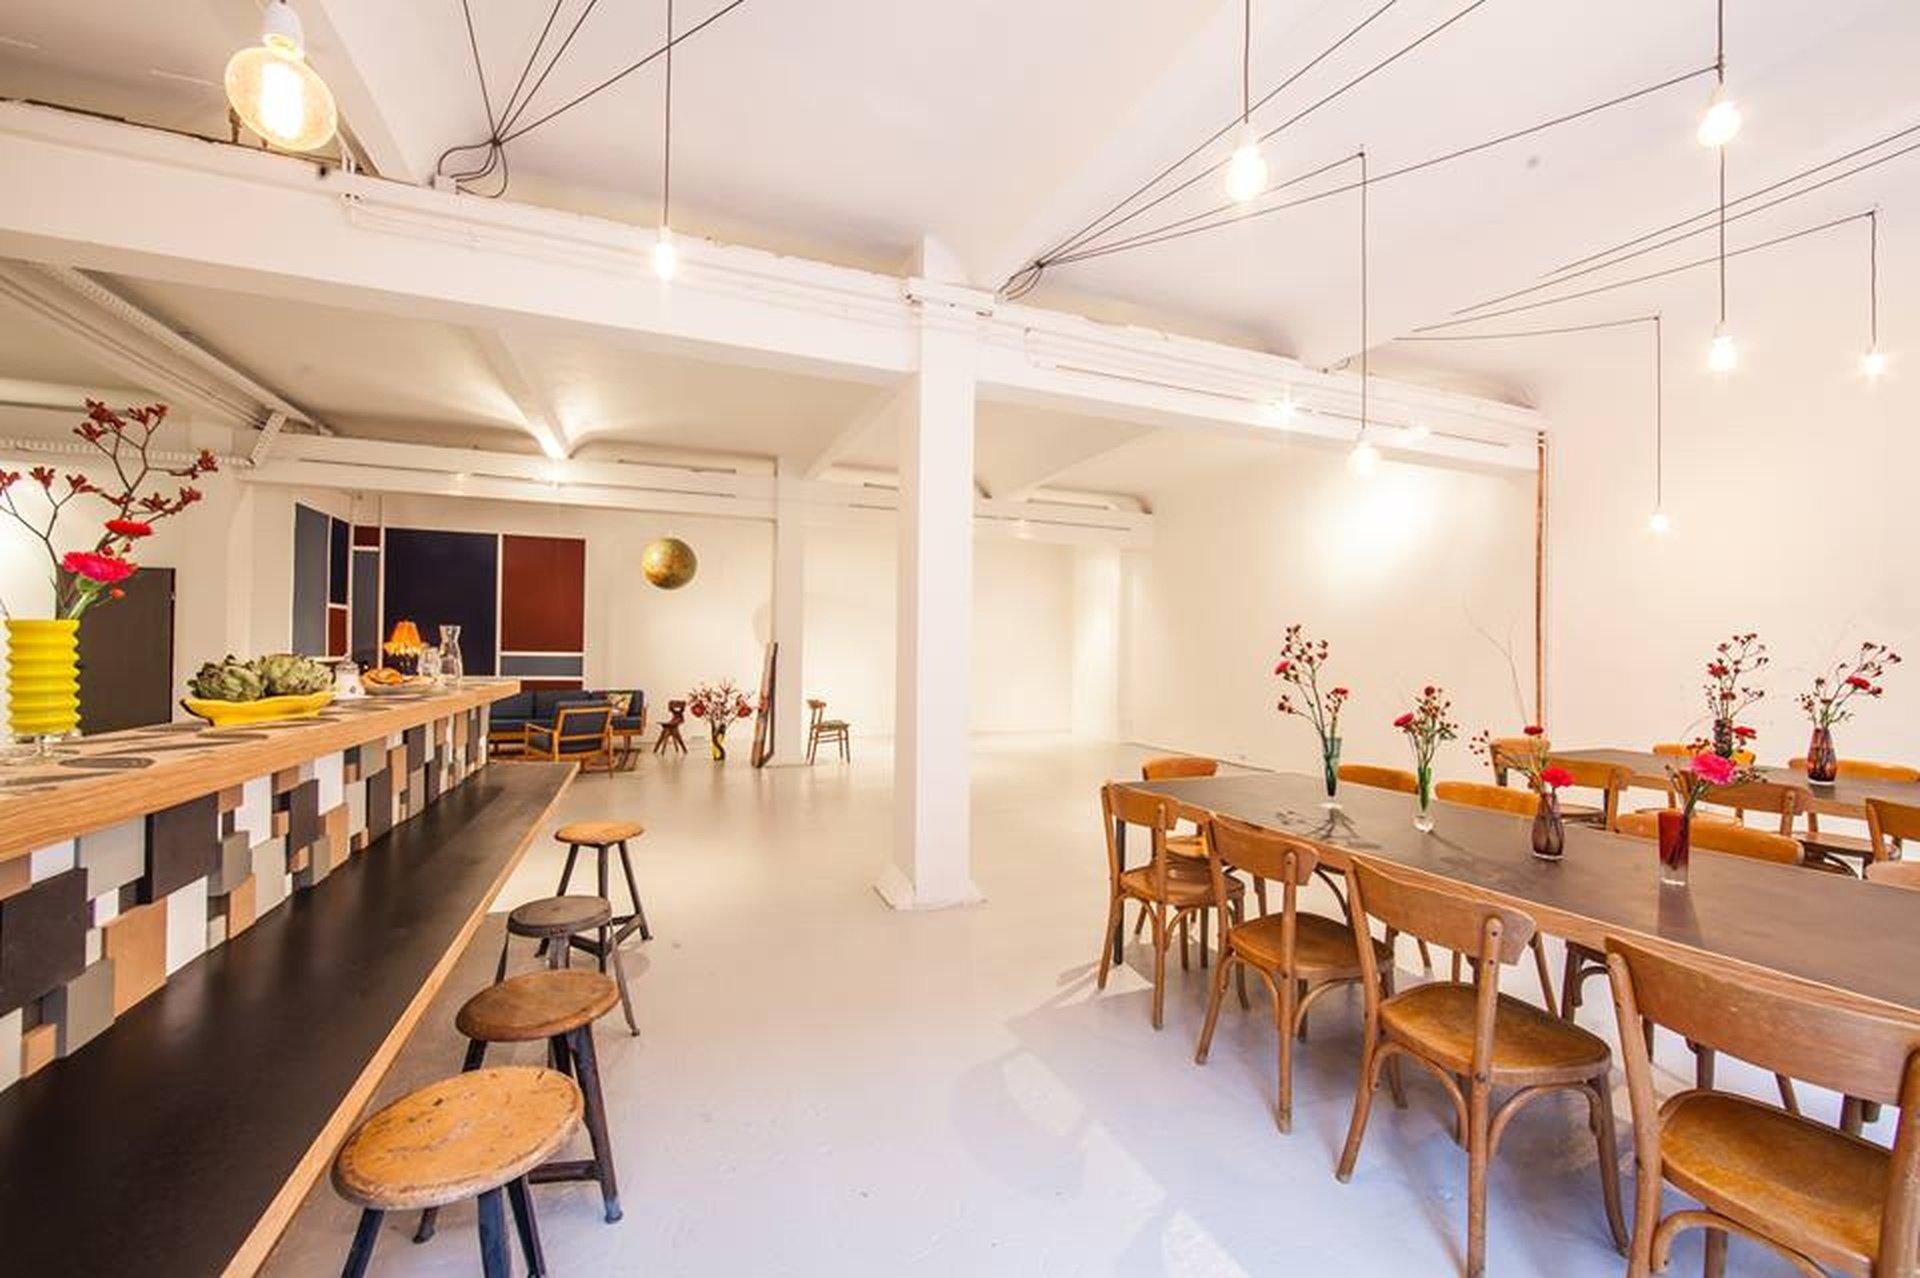 Hamburg workshop spaces Industriegebäude Juwelier Studio image 0